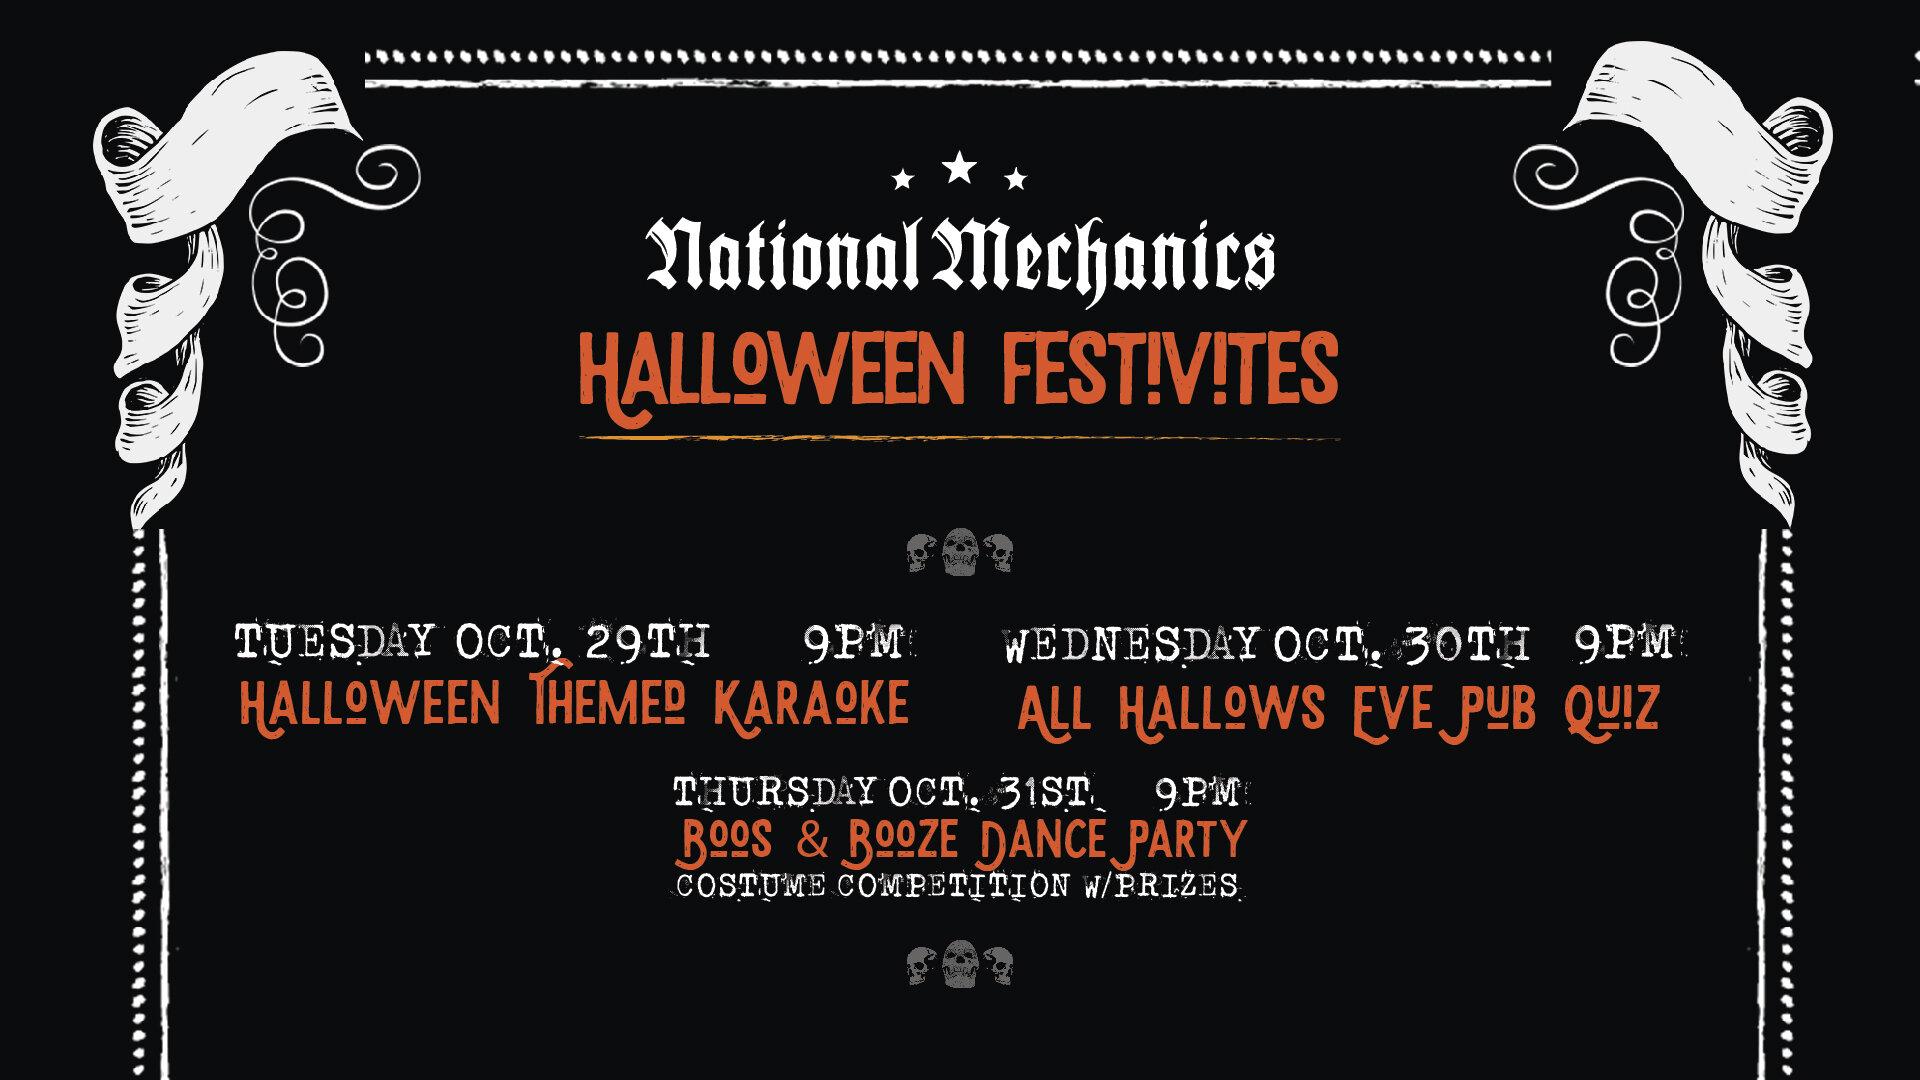 National Mechanics Halloween 2019_FB Event Cover-01 (1).jpg